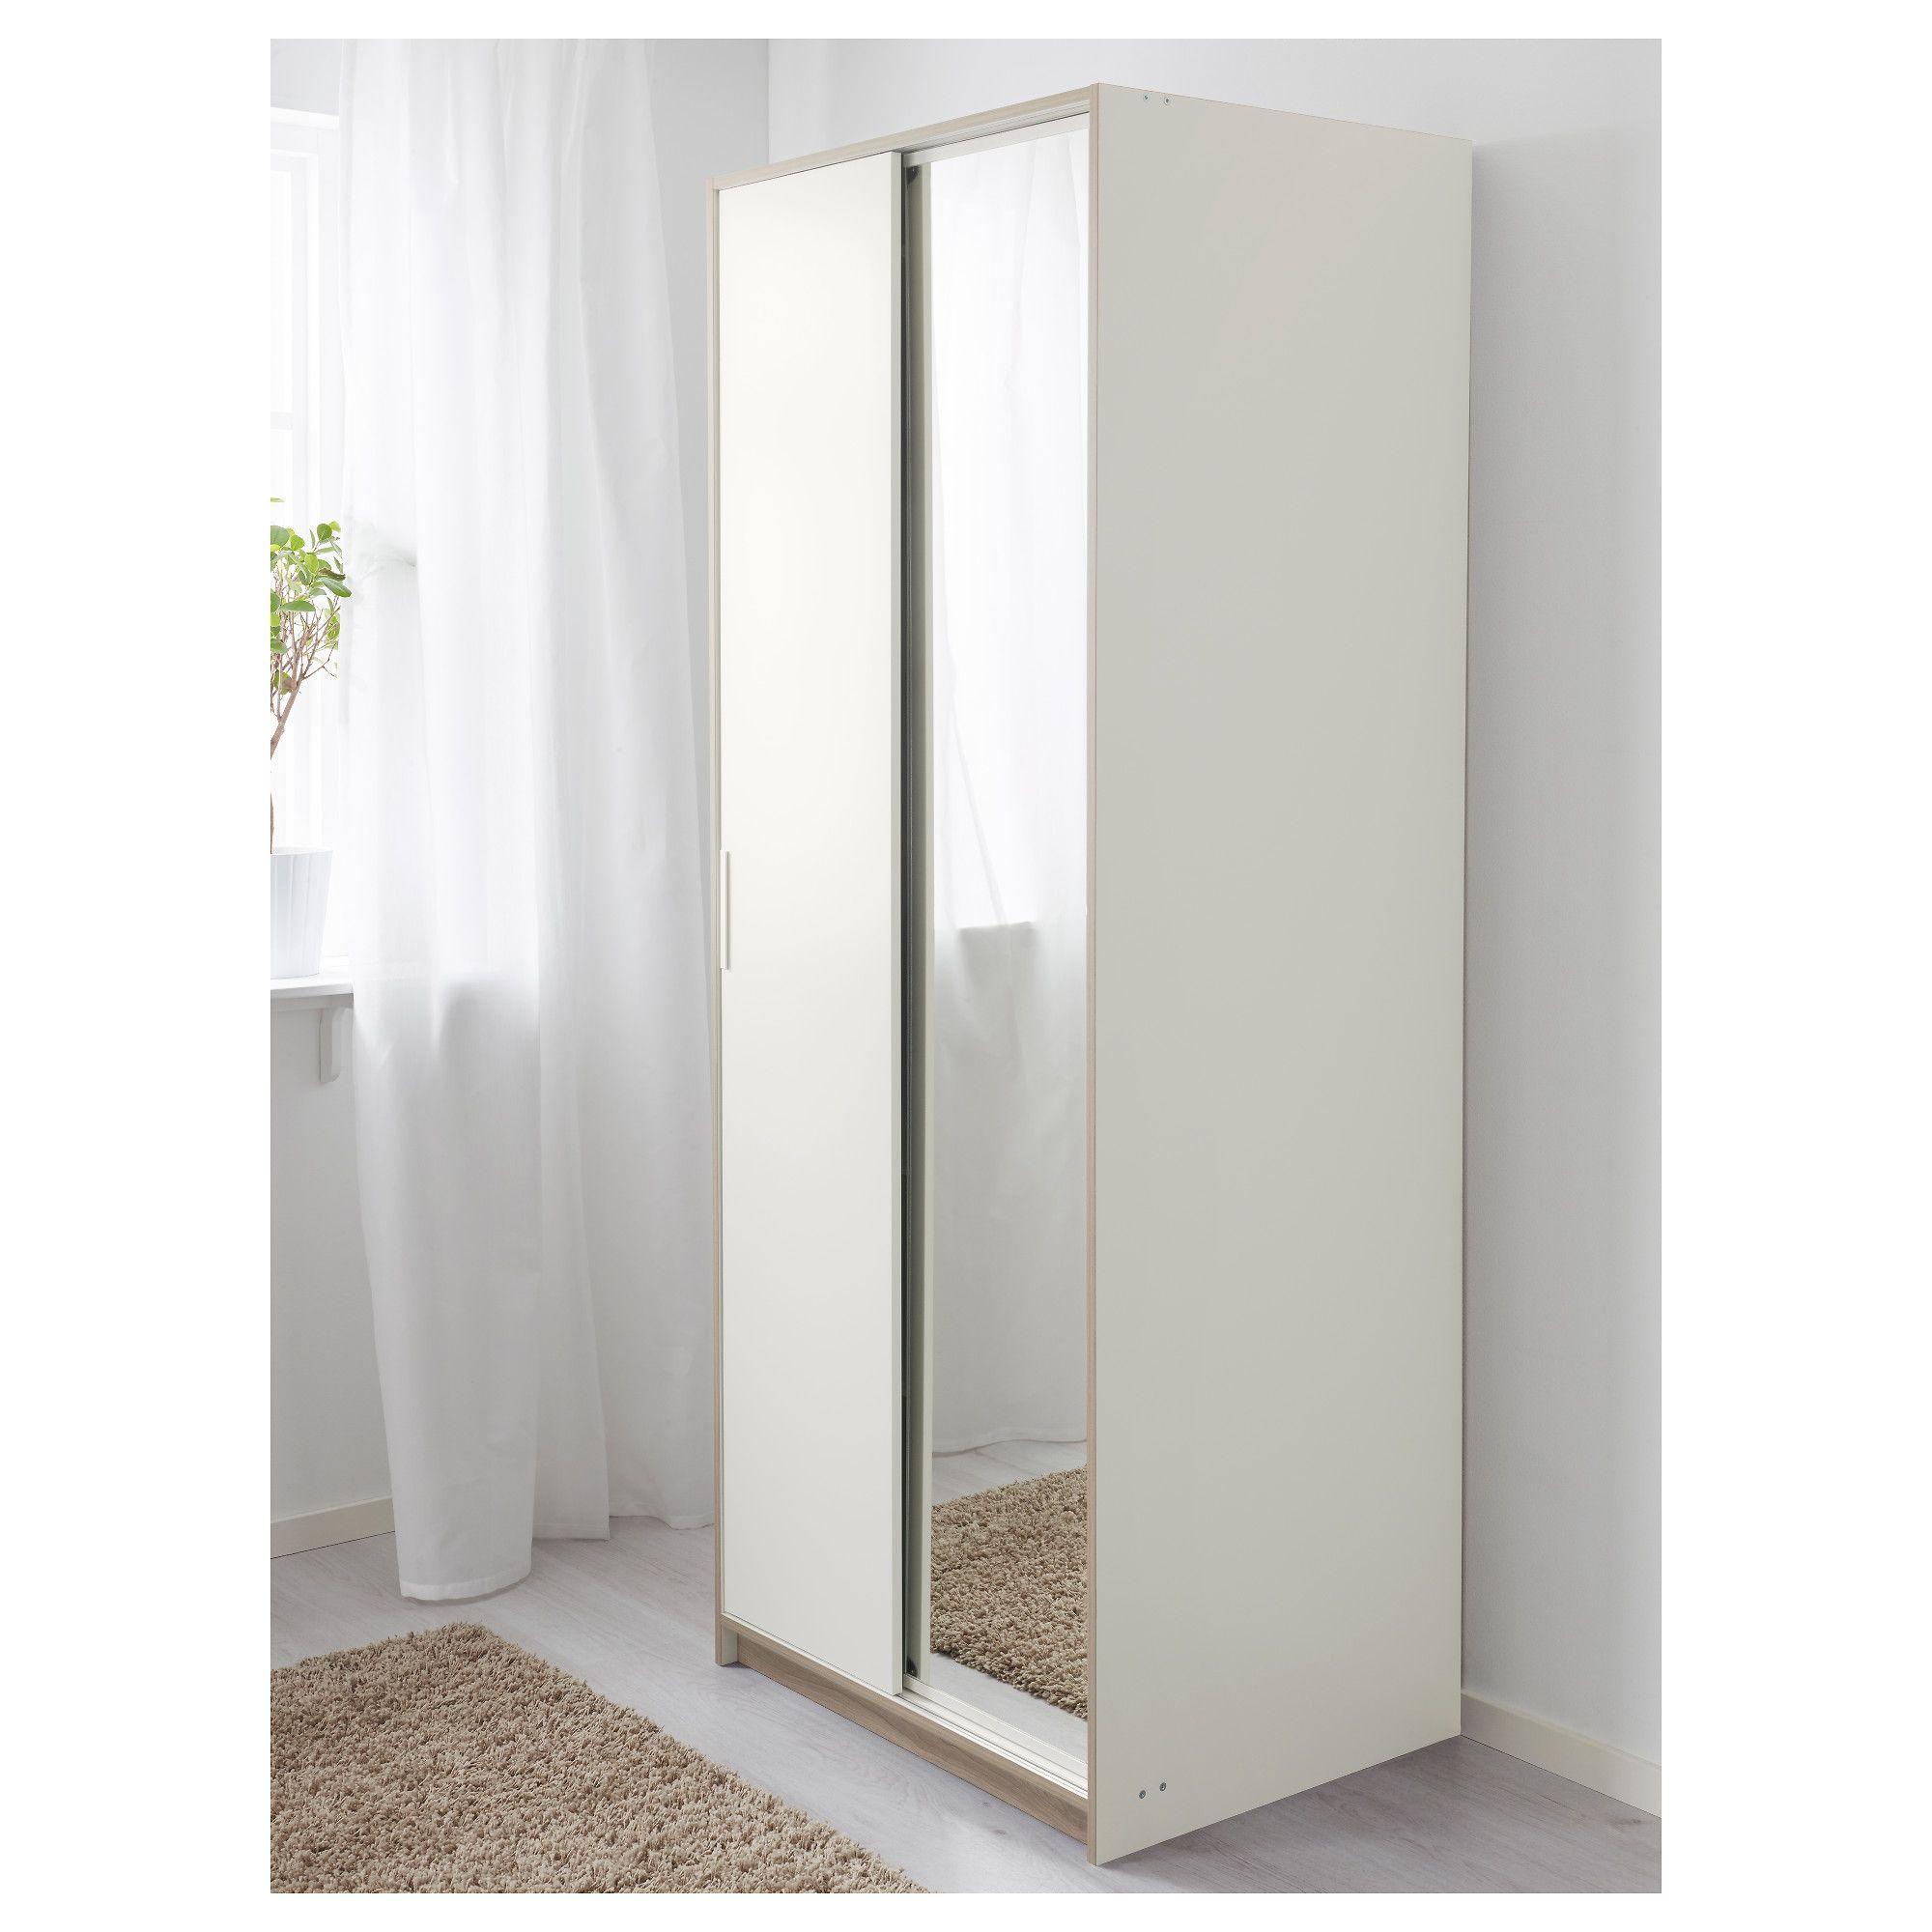 Trysil Wardrobe White Mirror Glass Ikea In 2019 Home